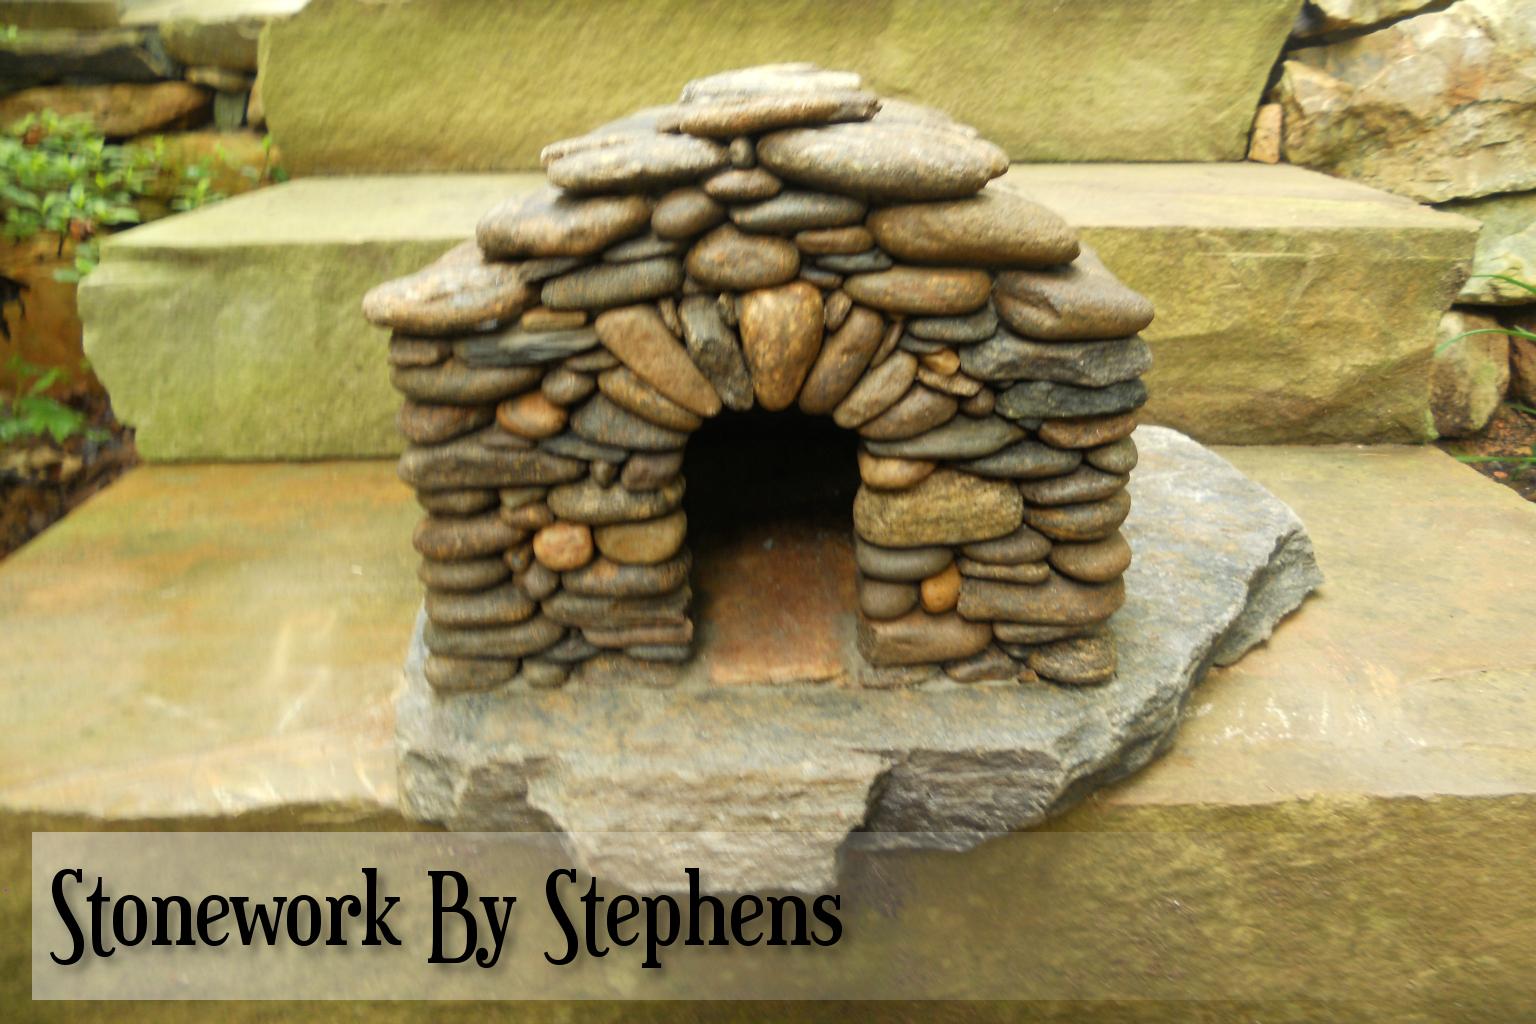 Miniature Stone Garden Houses. With Miniature Stone Garden Houses ...